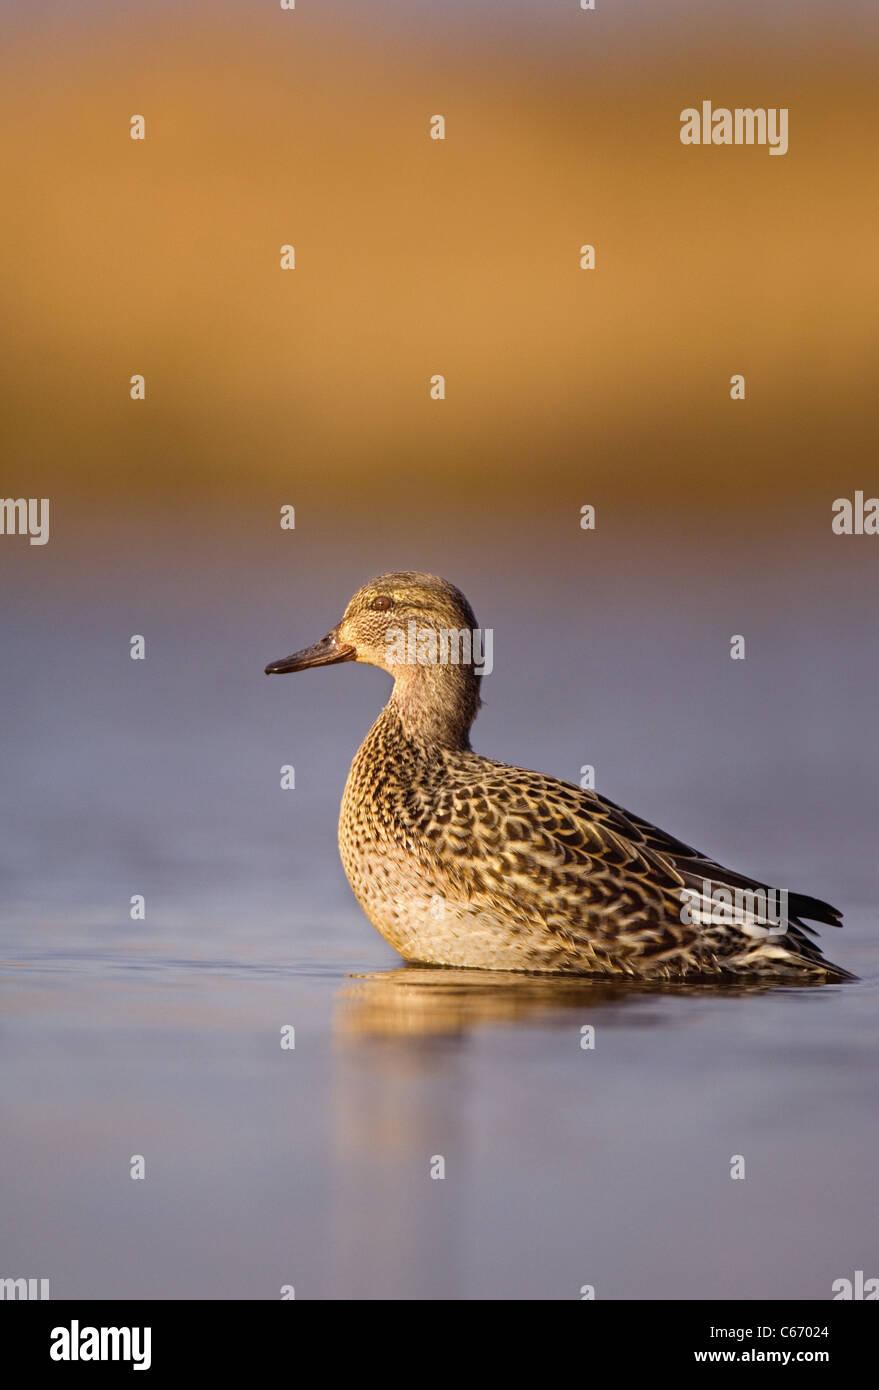 Anas crecca Perfil de una hembra adulta de alerta en golden la luz de la mañana. Norfolk, Reino Unido. Fotógrafo.Andrew Foto de stock